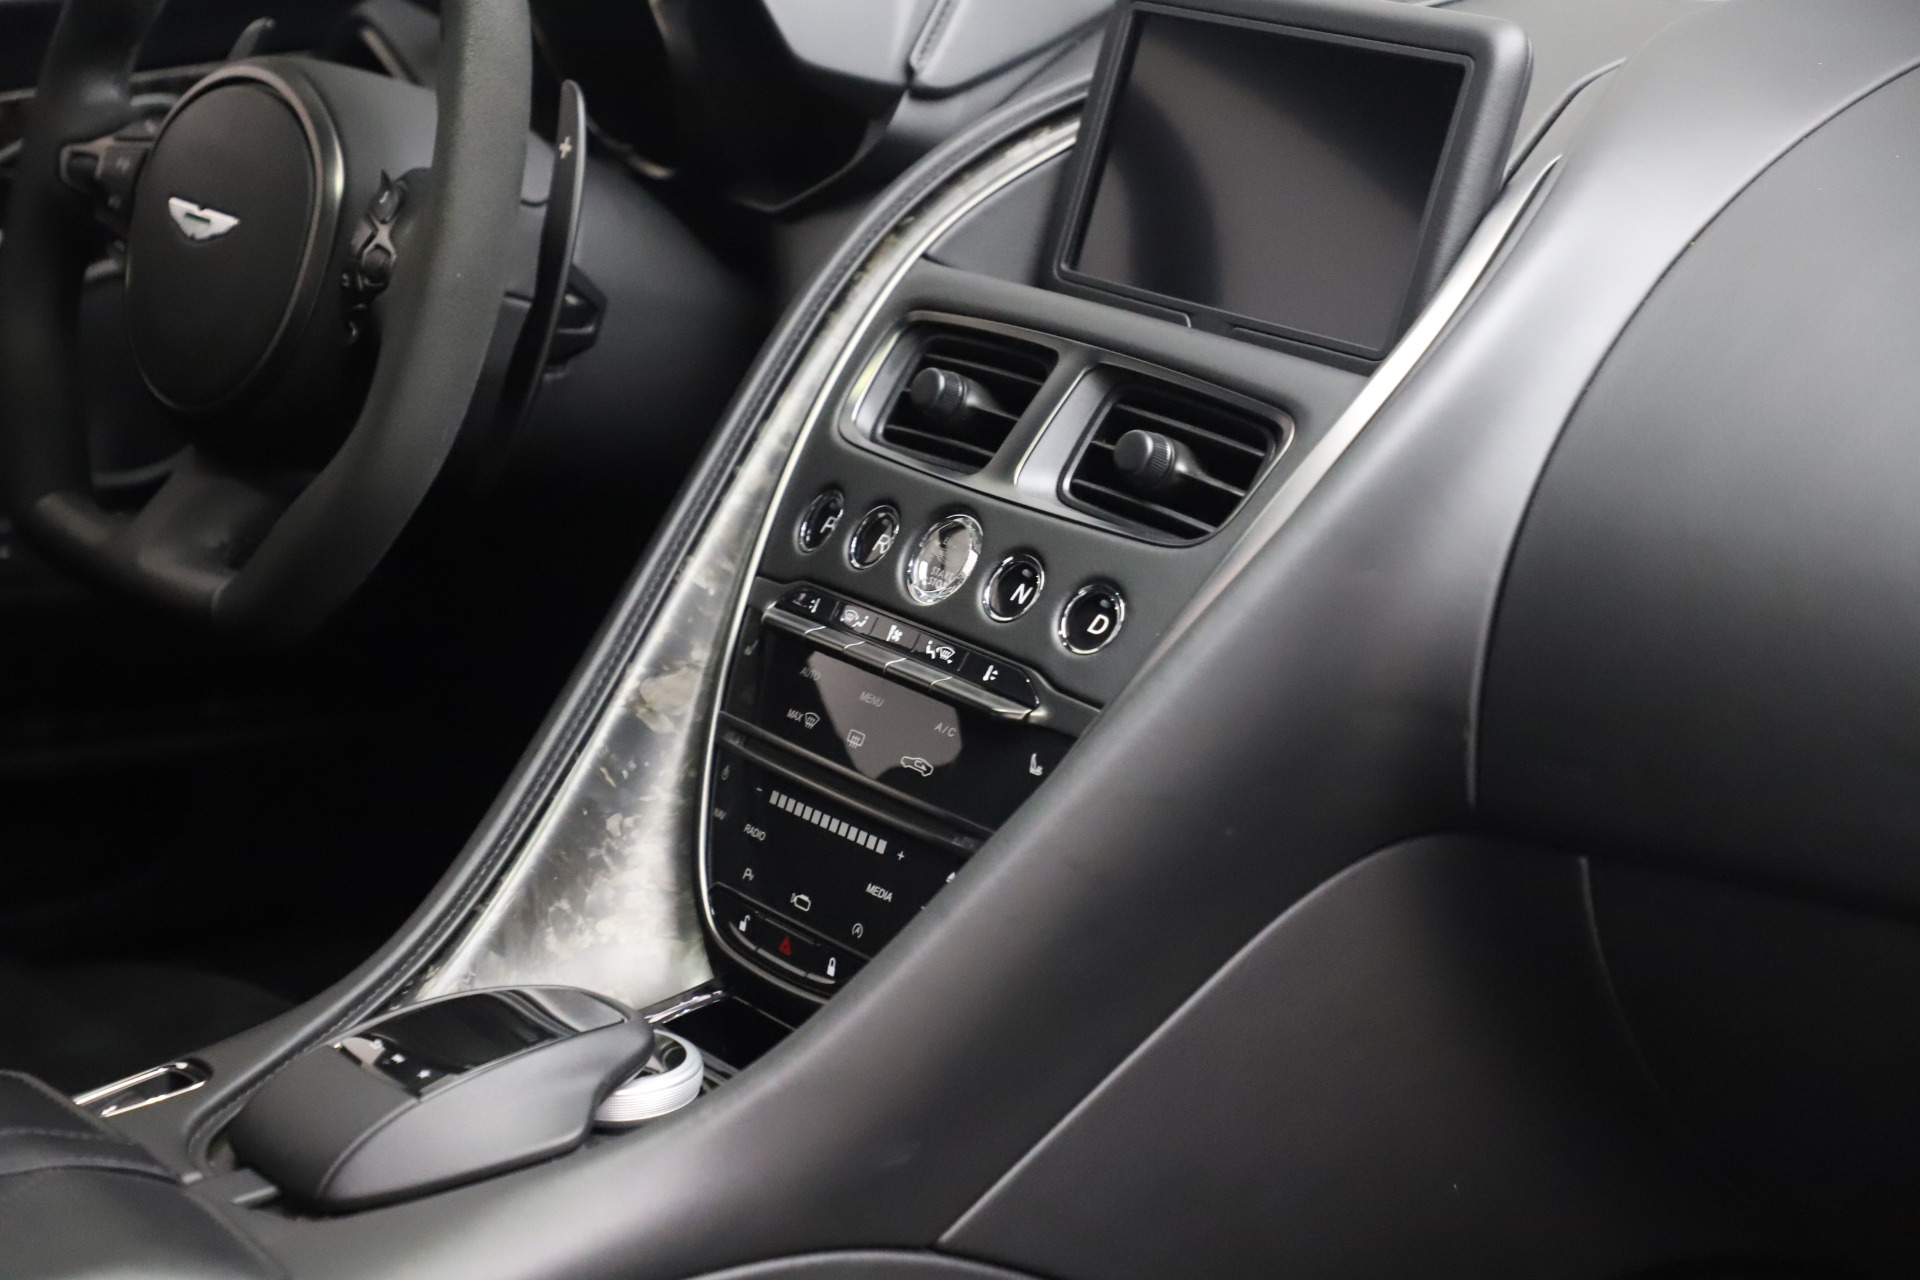 Used 2019 Aston Martin DBS Superleggera Coupe For Sale In Greenwich, CT. Alfa Romeo of Greenwich, A1438B 3570_p25